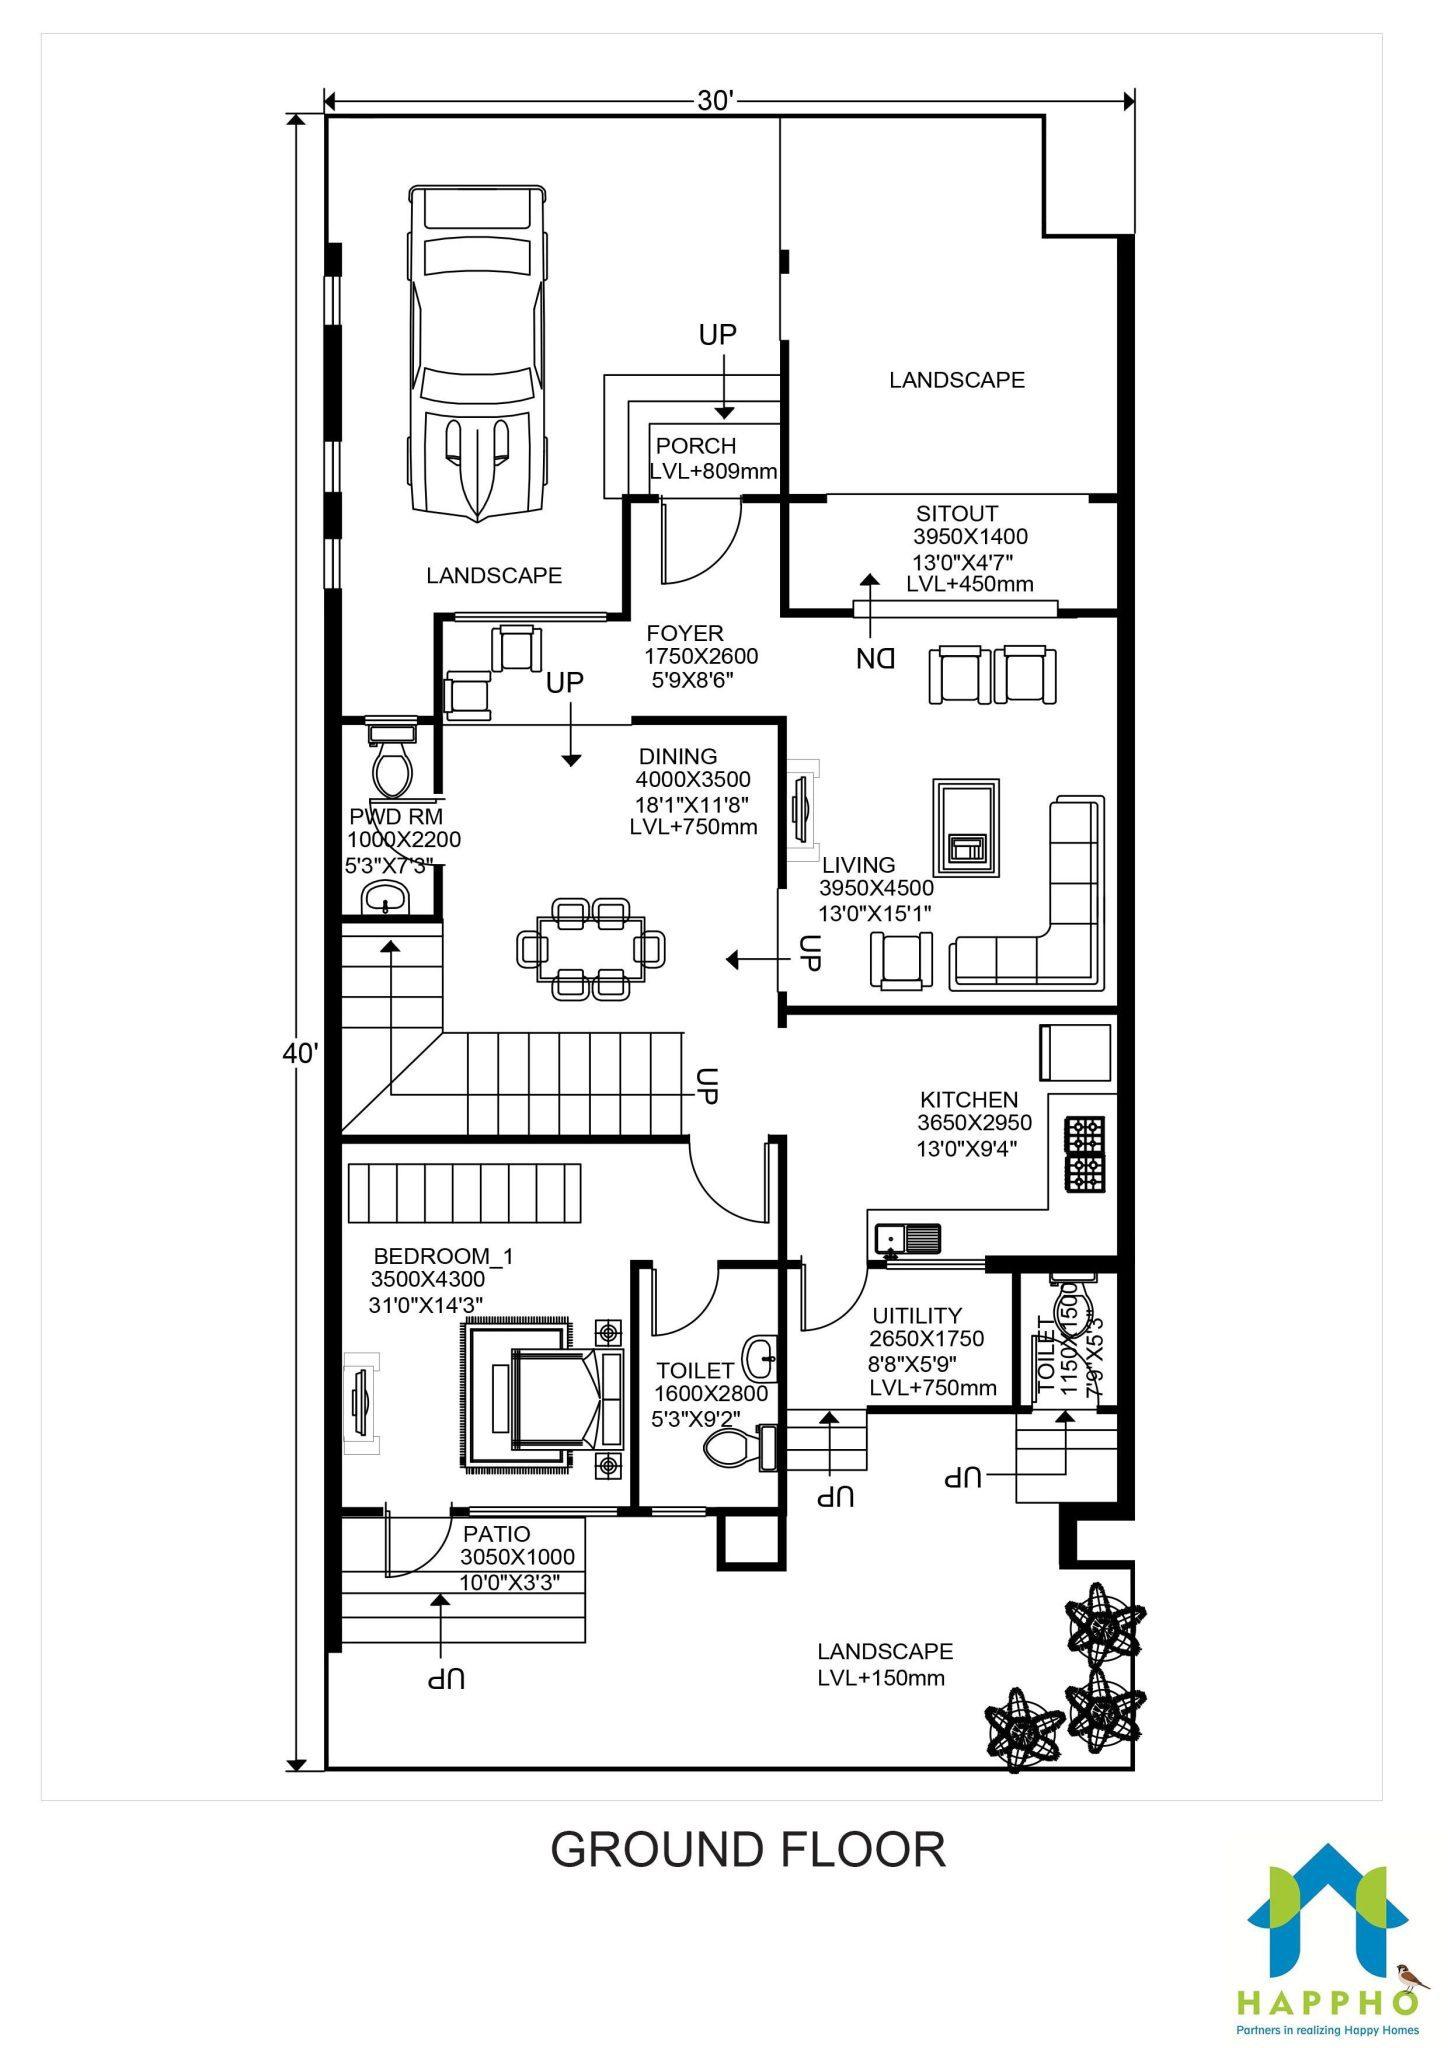 hight resolution of floor plan for 30 x 40 feet plot 3 bhk 1200 square feet 134 sq